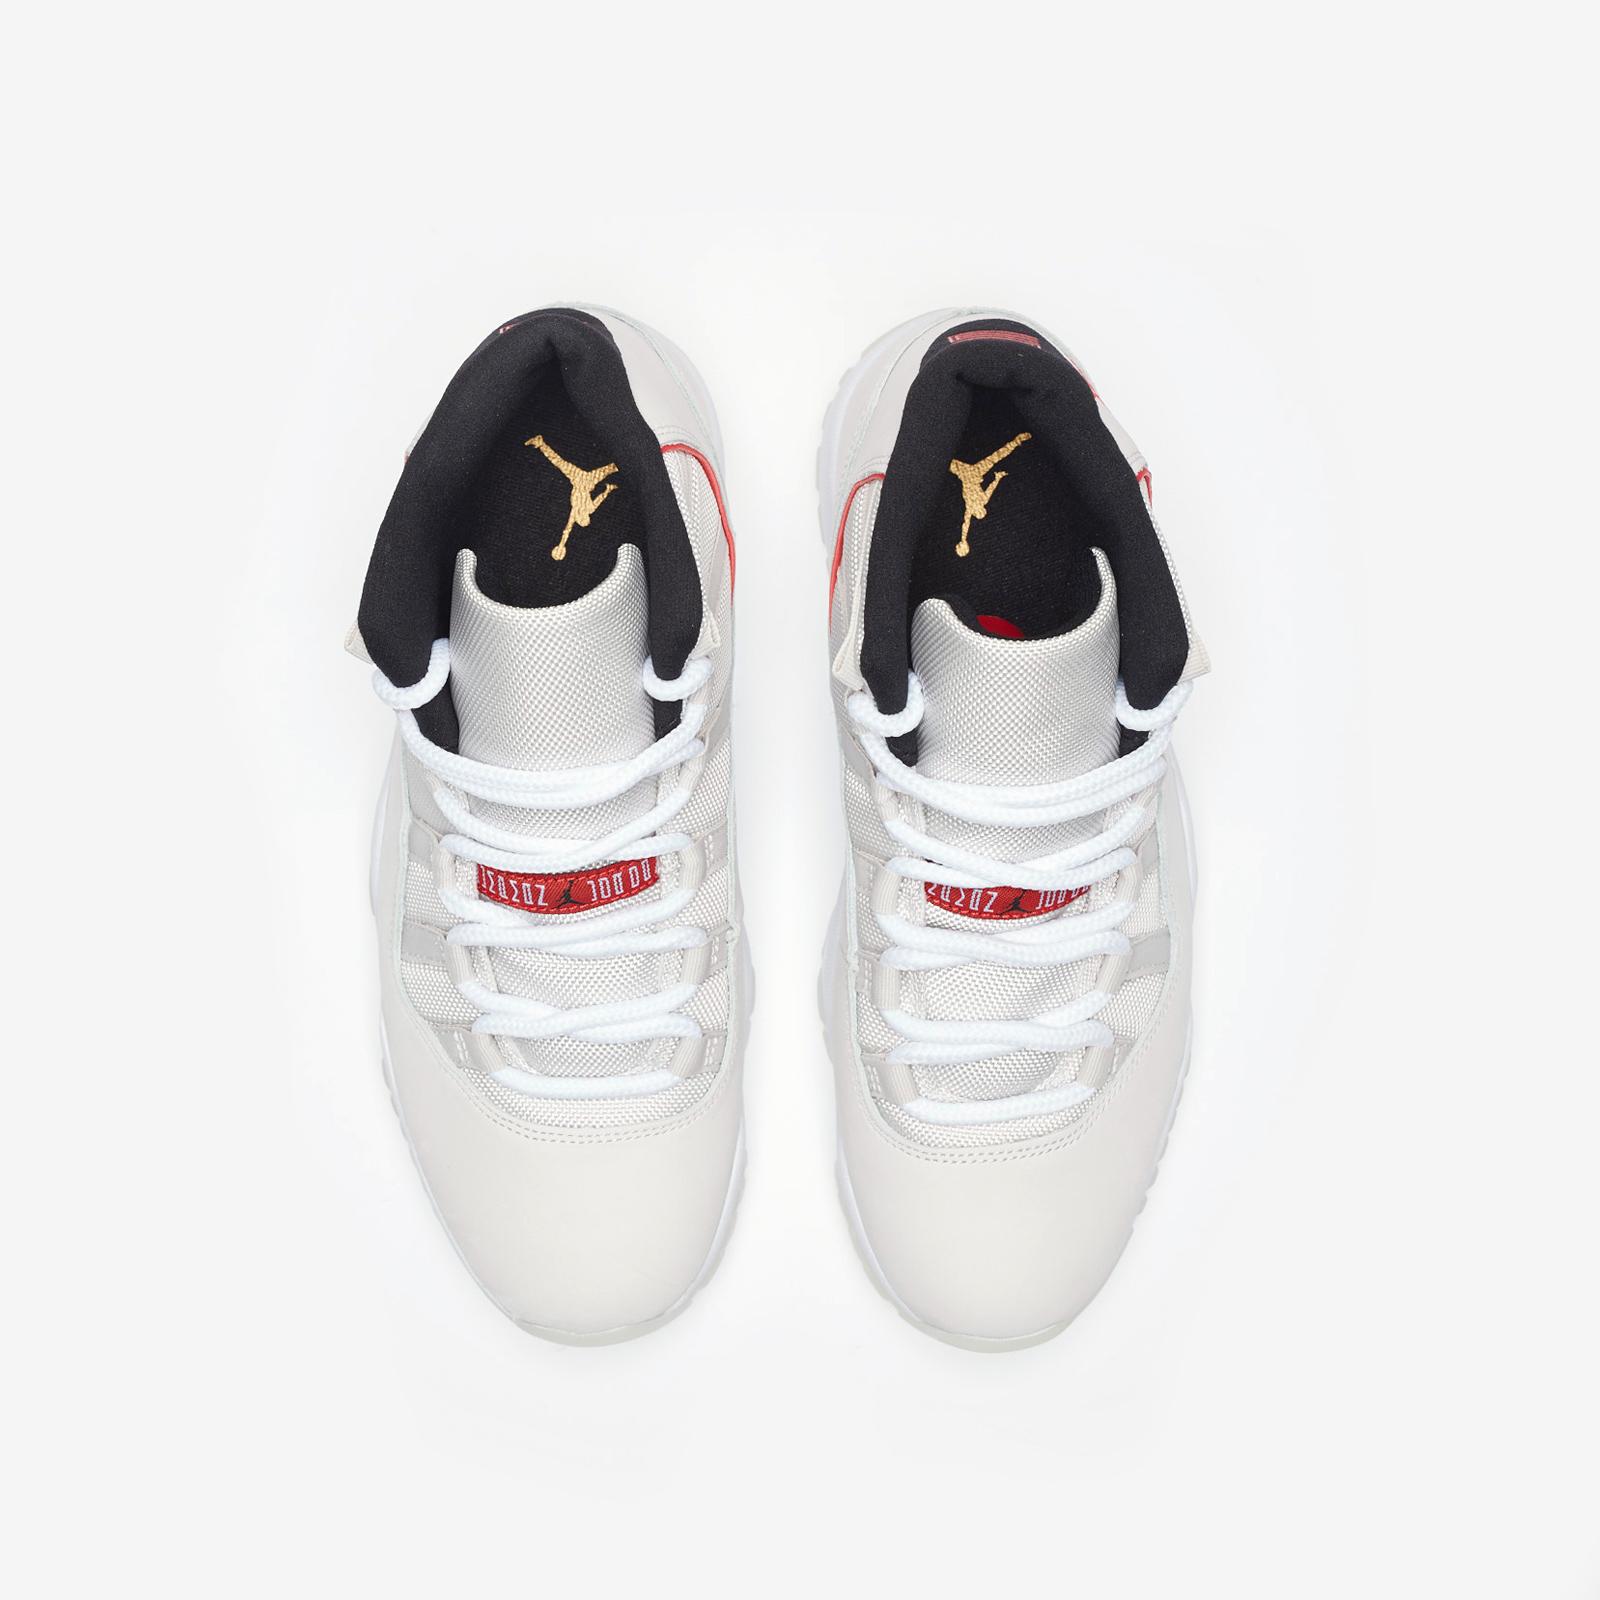 dda79106e783 Jordan Brand Air Jordan 11 Retro - 378037-016 - Sneakersnstuff ...